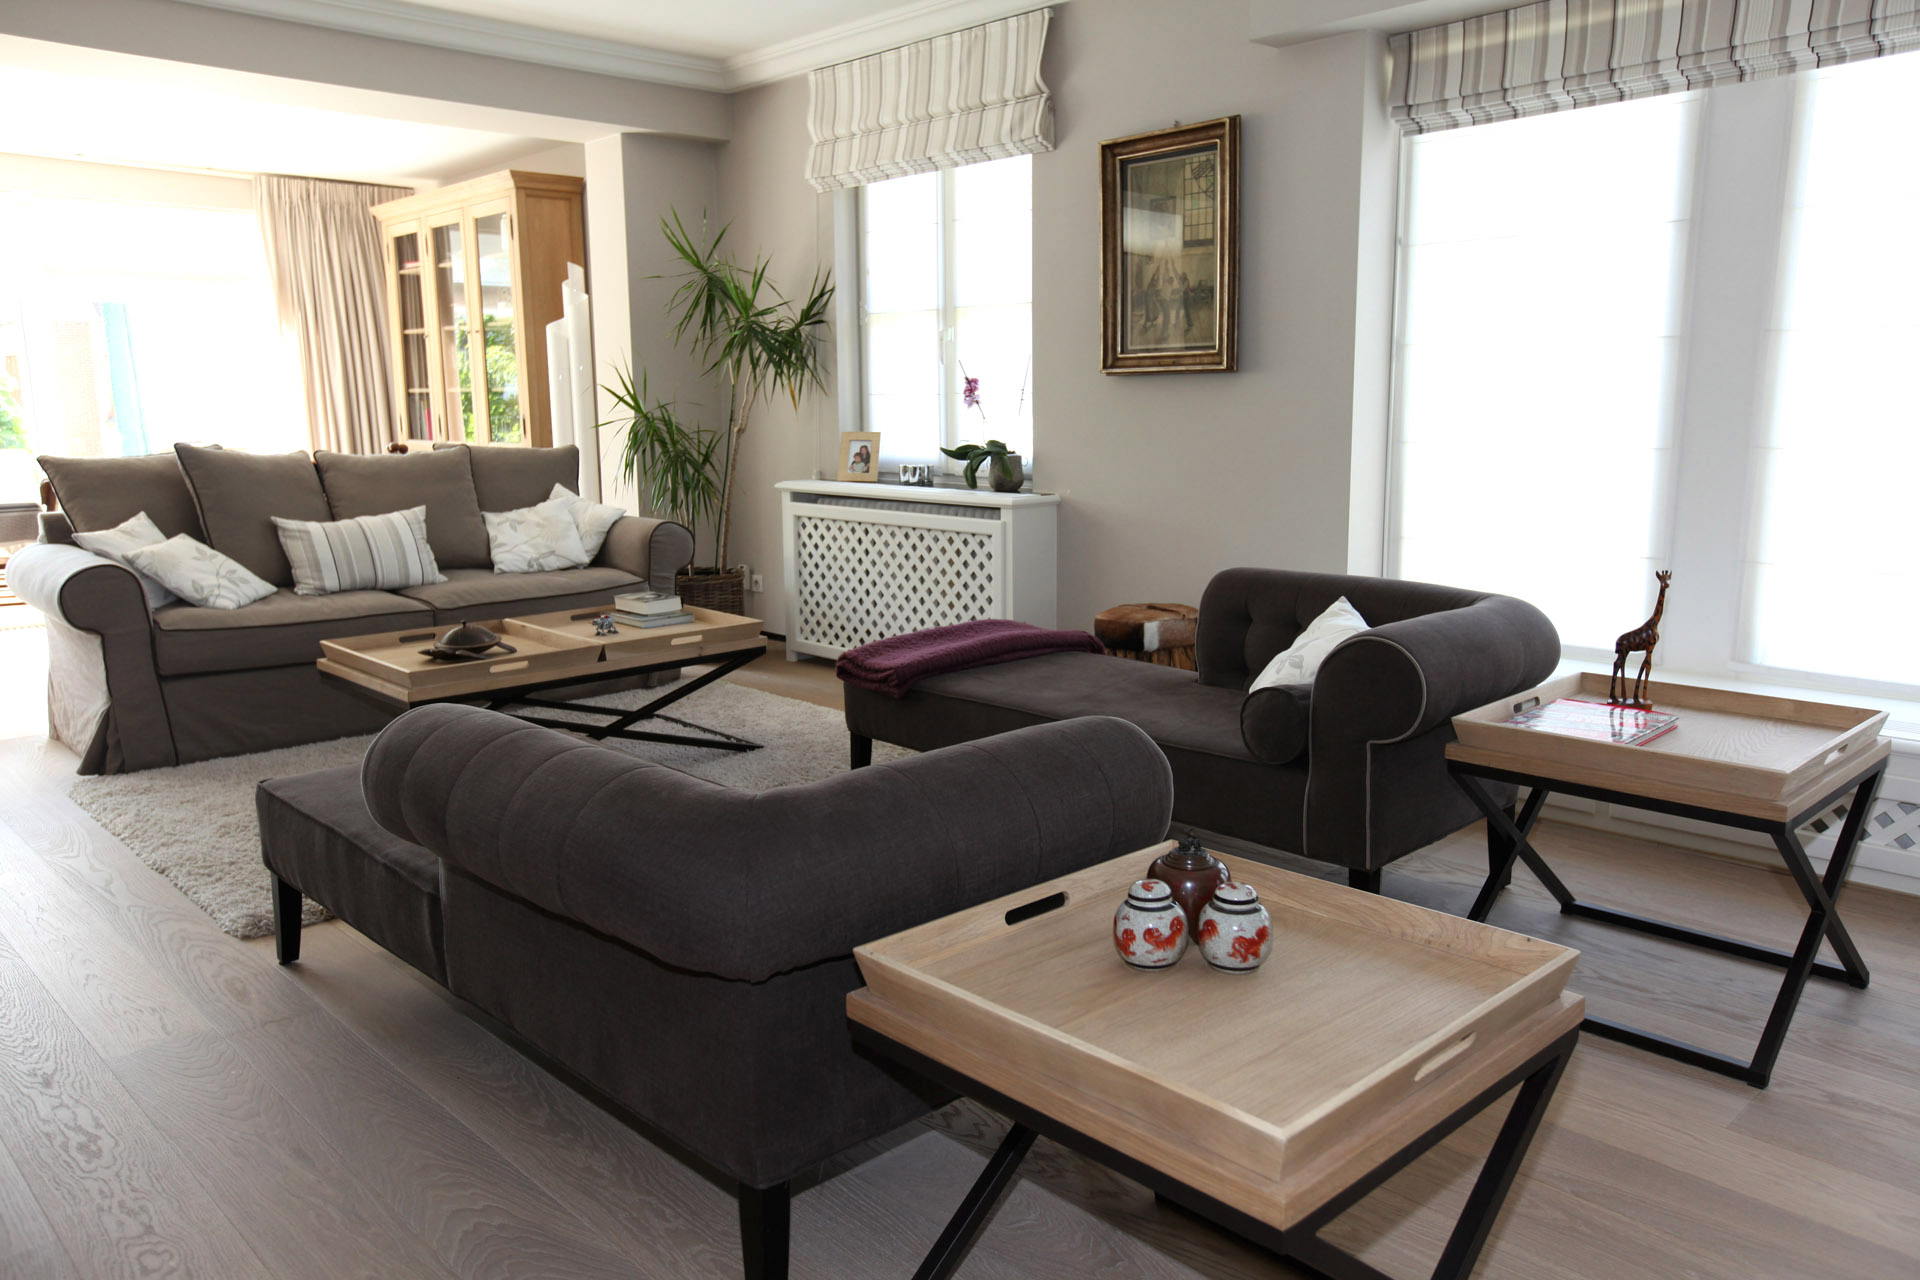 Landelijke villa Woluwe - Marcotte Style